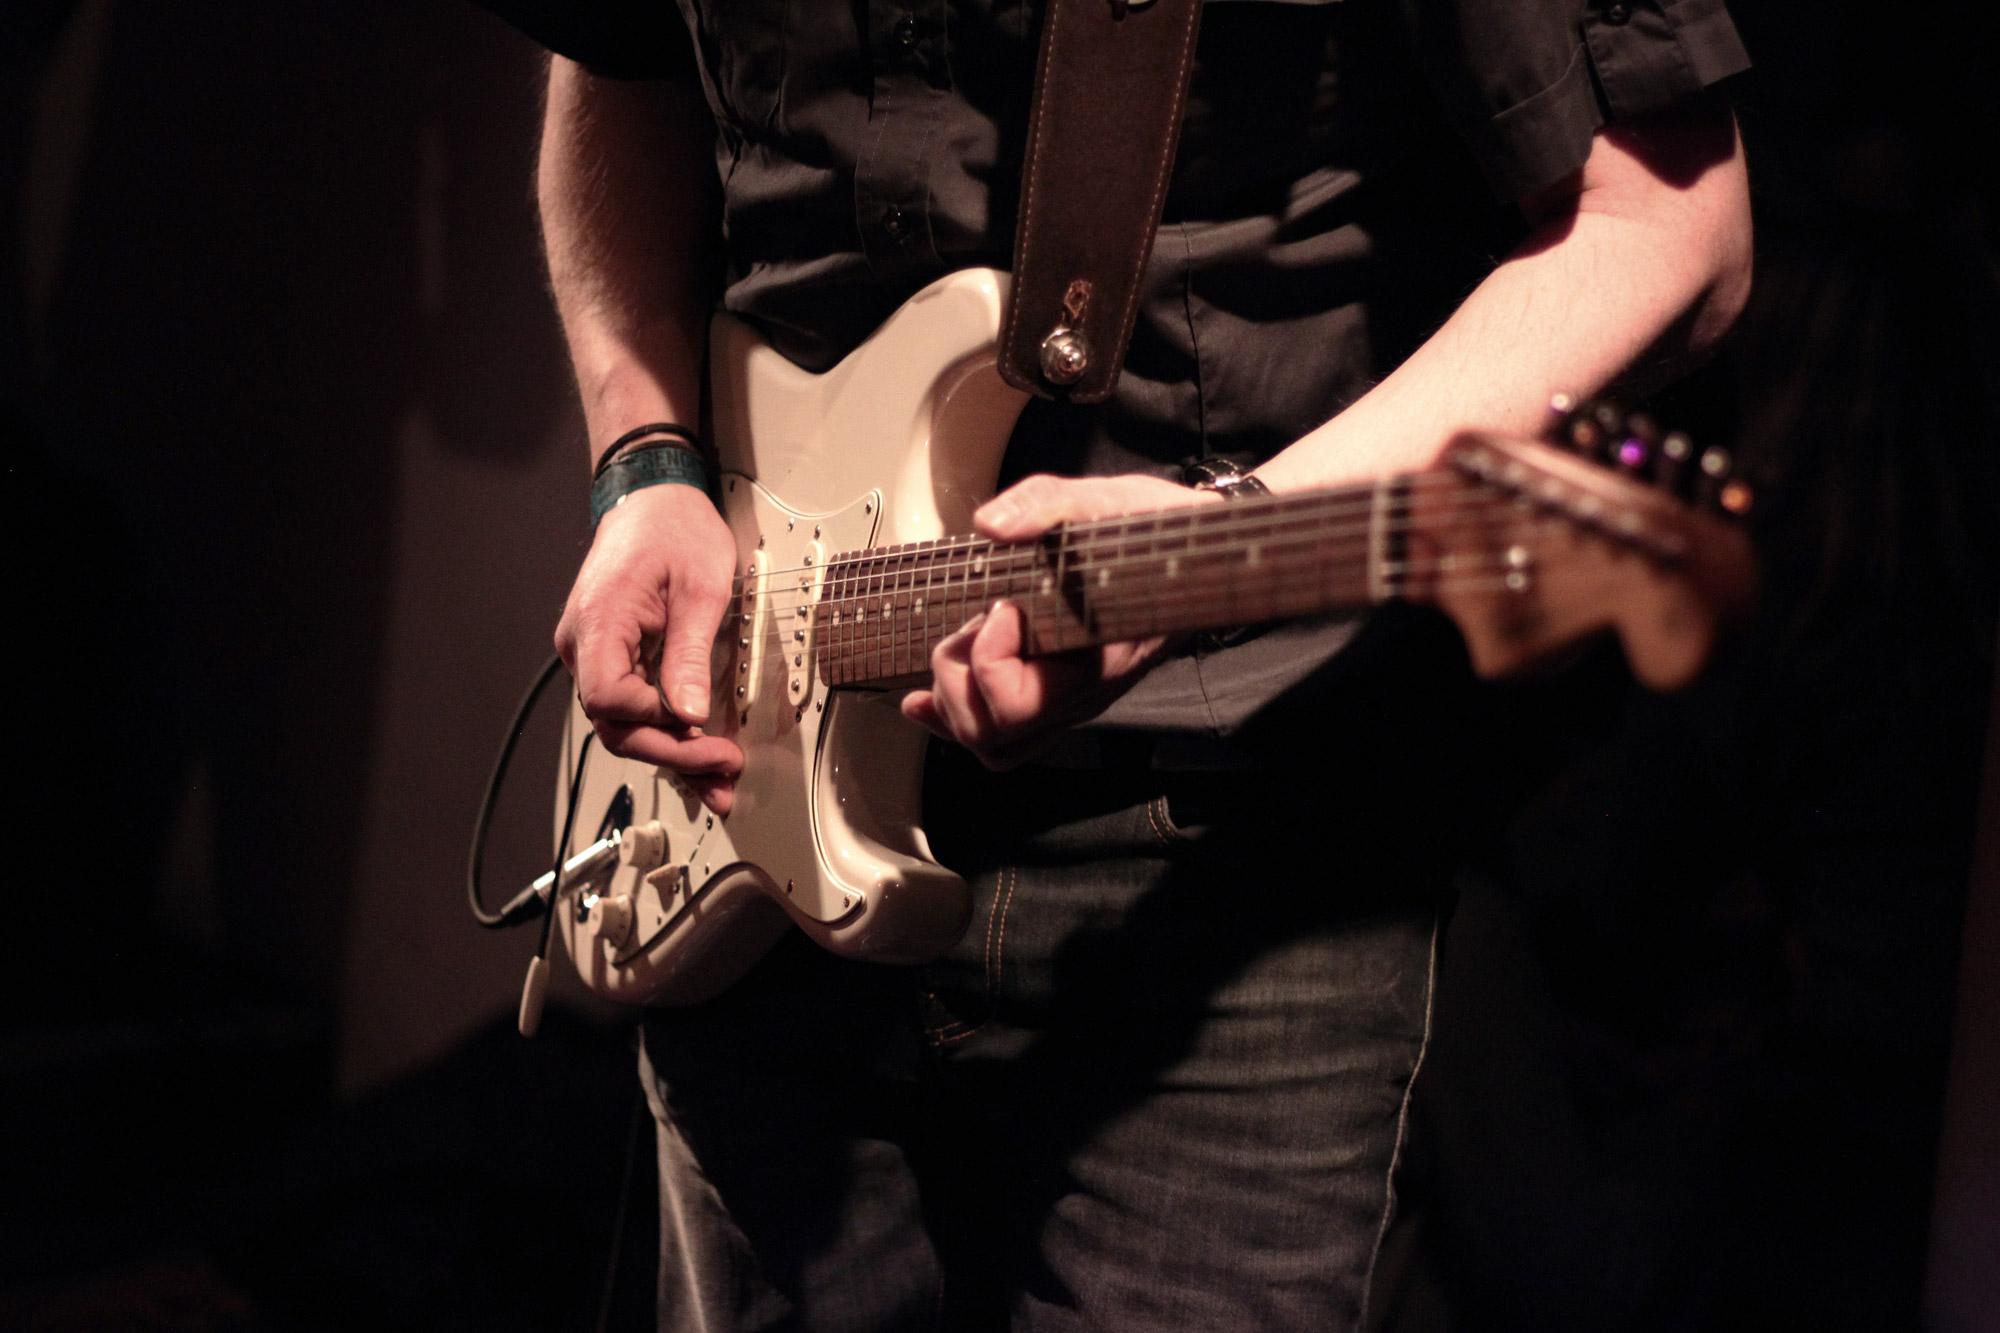 E-Gitarre spielen